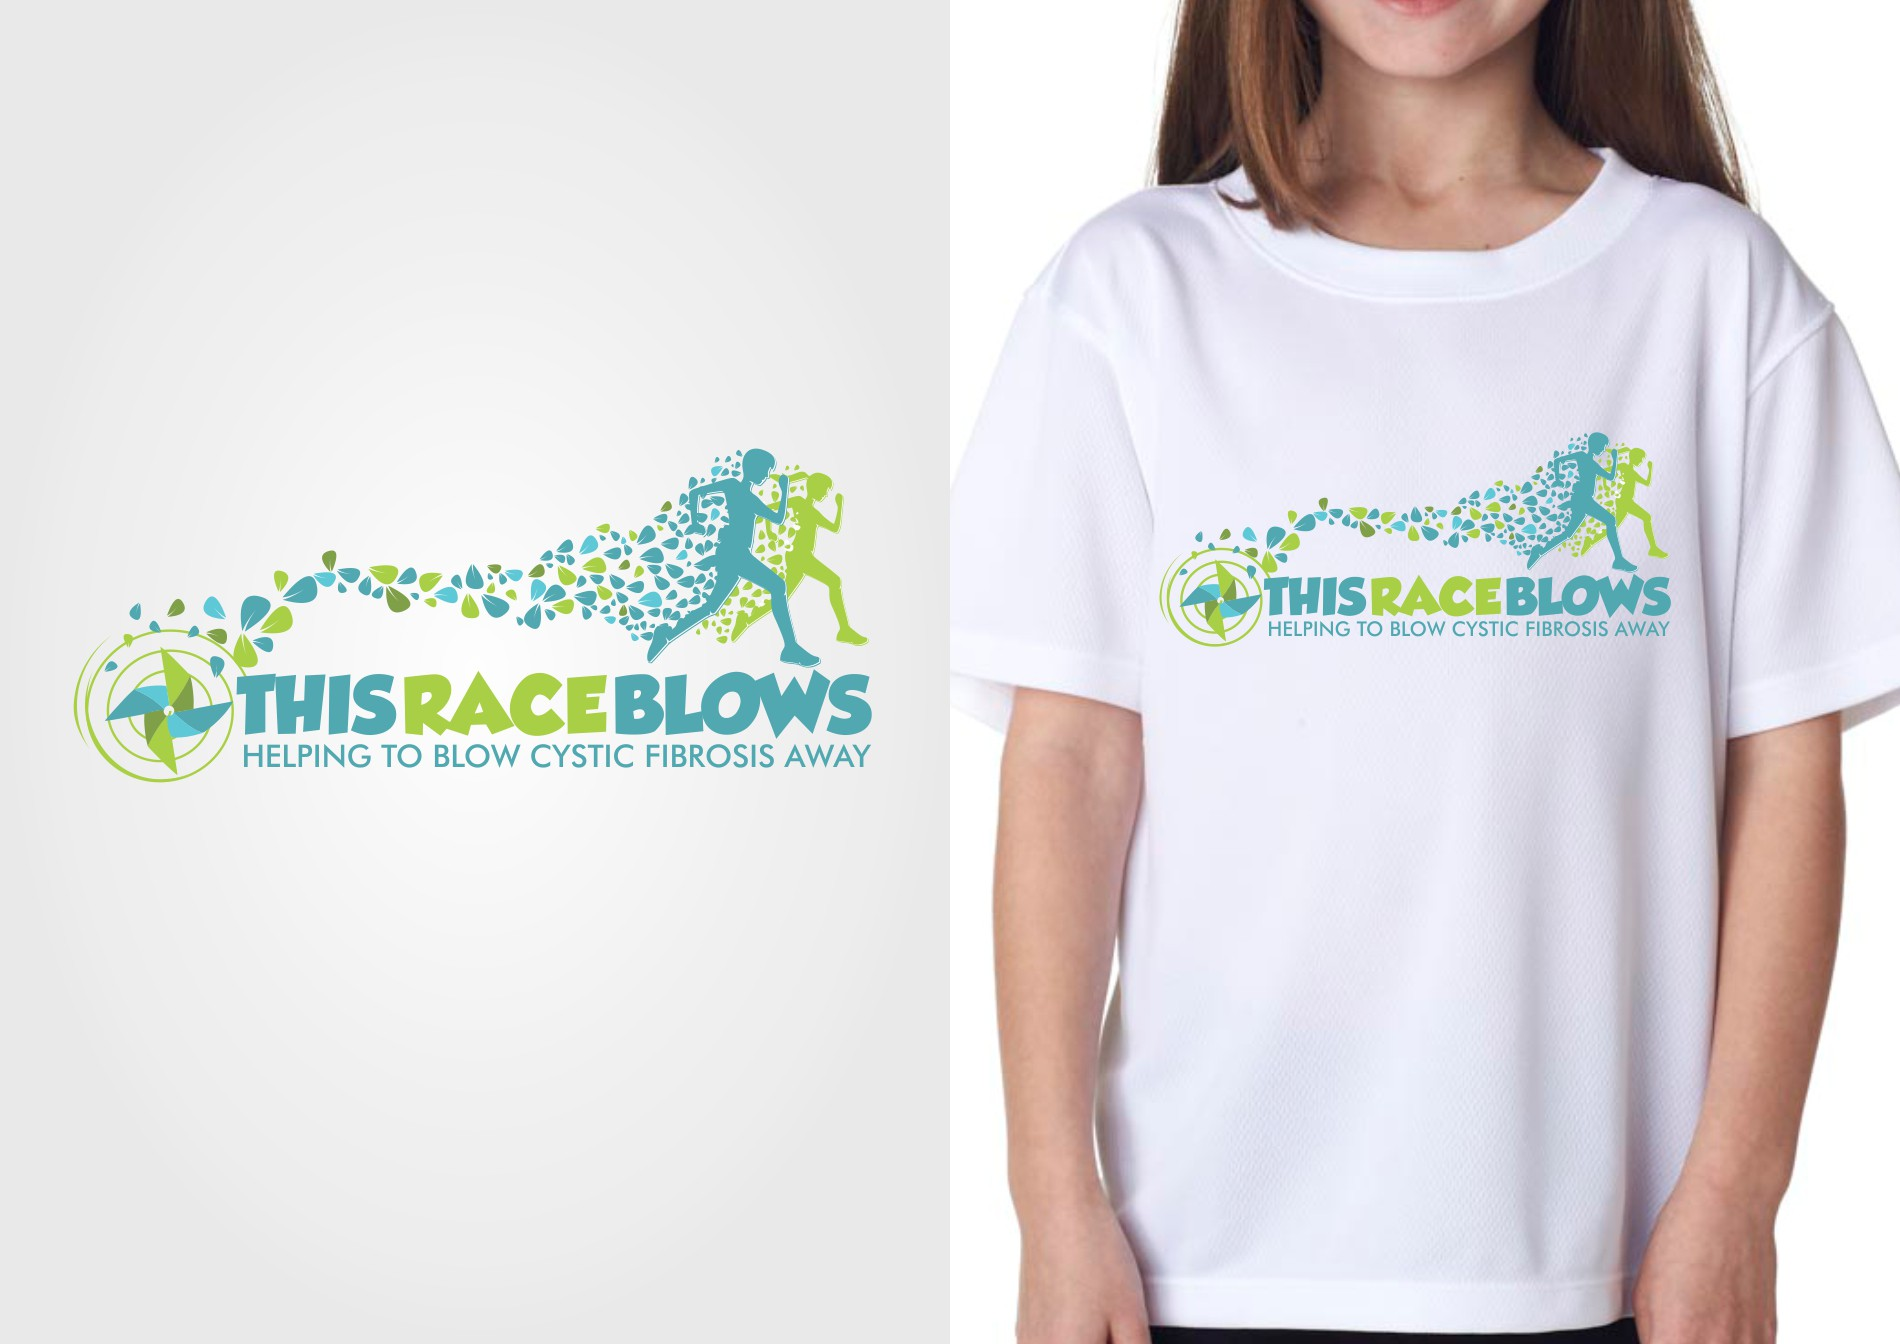 Create a fun T-shirt design for This Race Blows